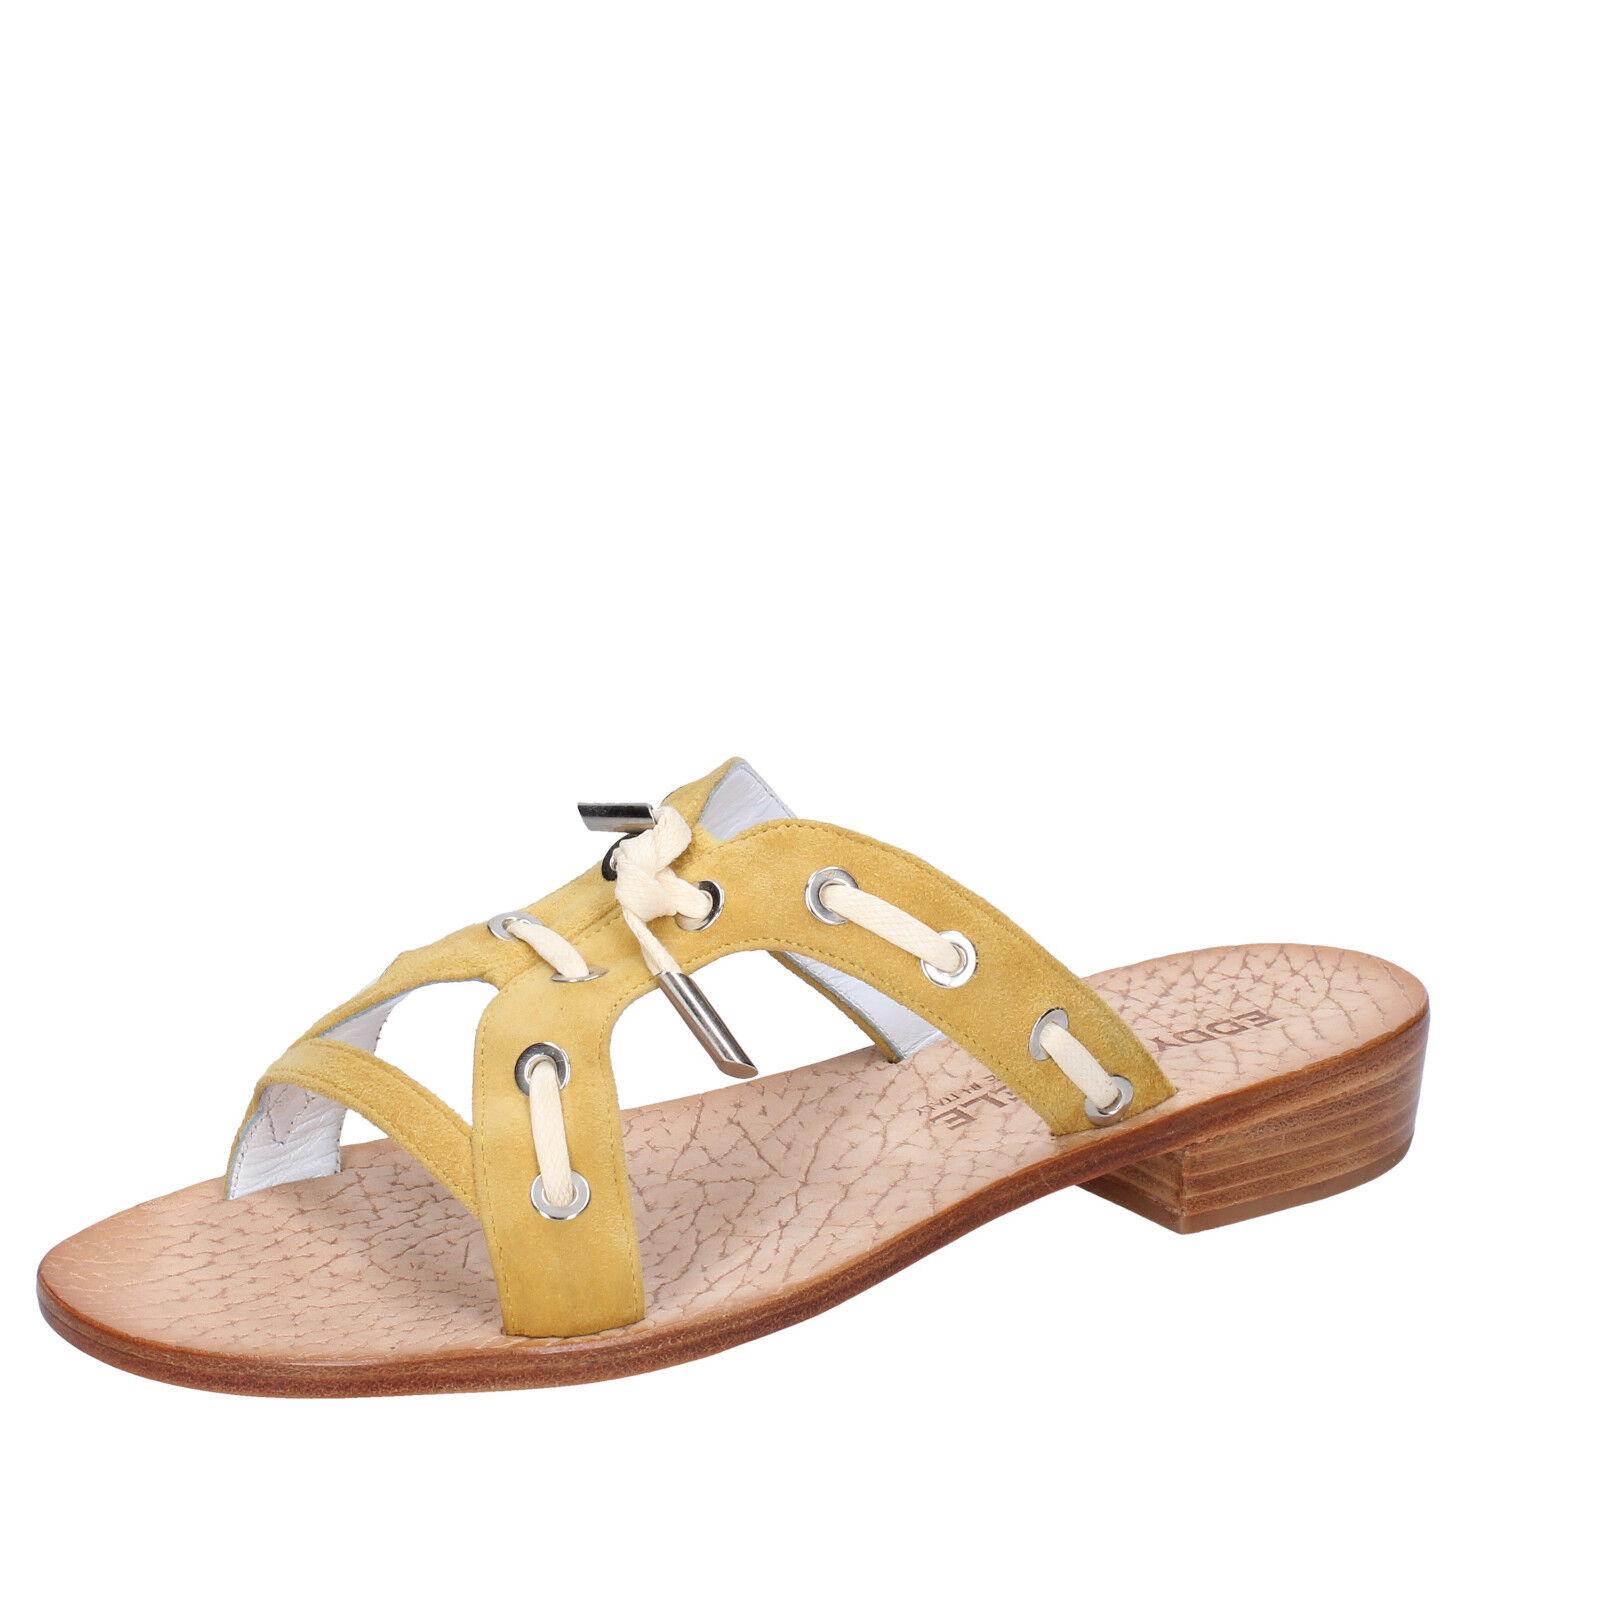 Chaussures Femmes Eddy Daniele 7 (UE 37) Sandales Jaune Daim AW334-37